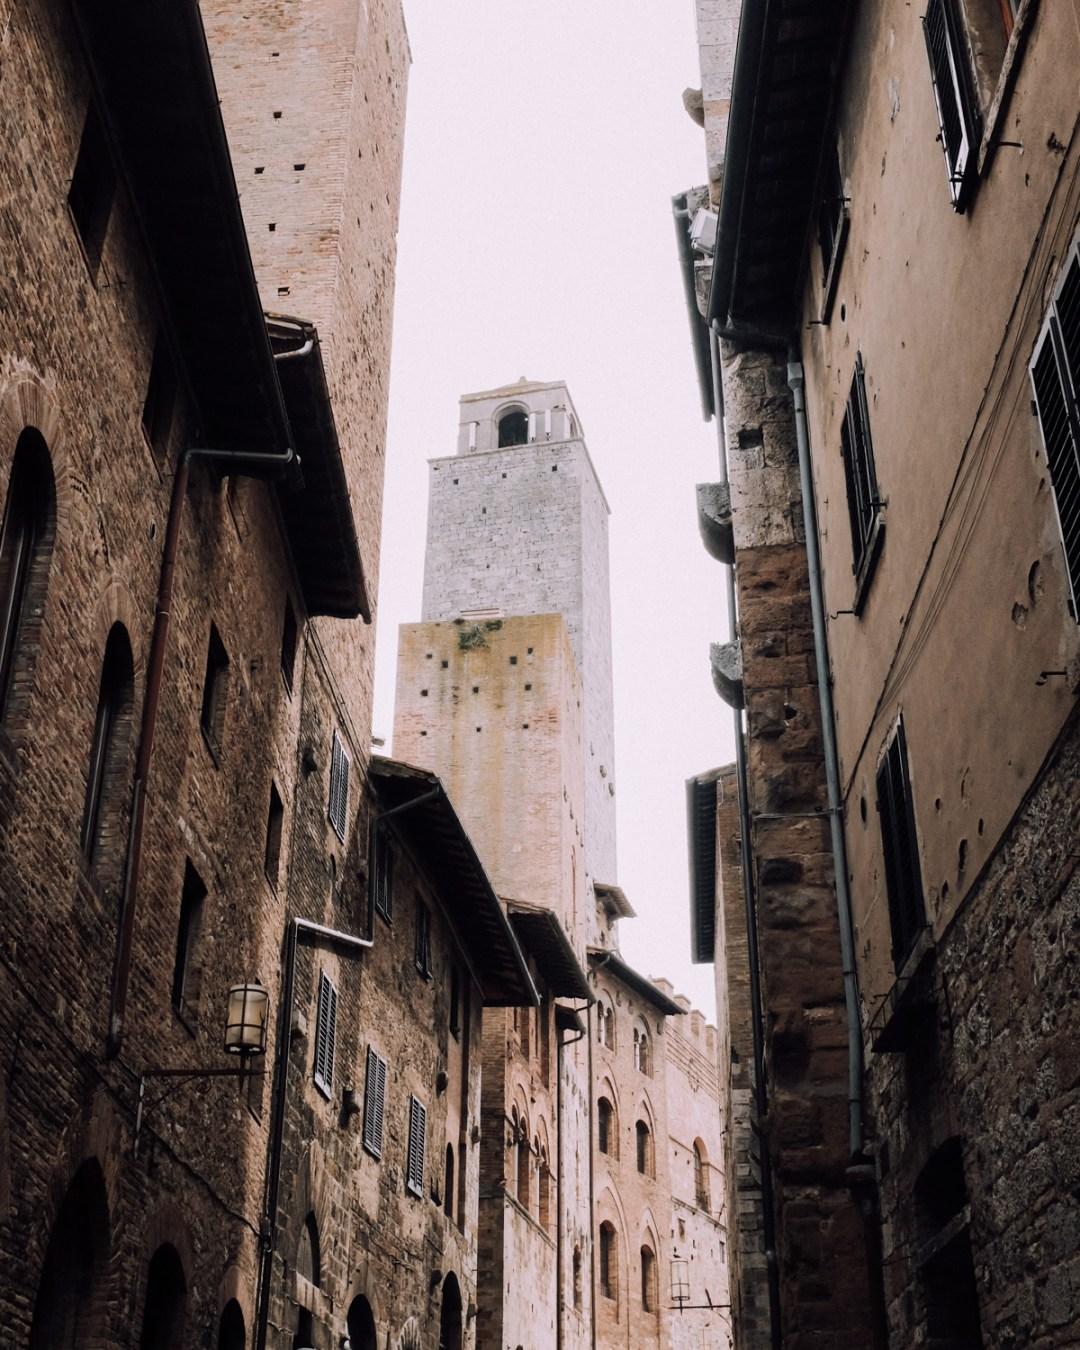 inastil, Ü50Blogger, Reiseblogger, Toskana, Villa, Florenz, Siena, Certaldo, Lifestyle, Italienreise, Italienliebe, Cabriotour-22